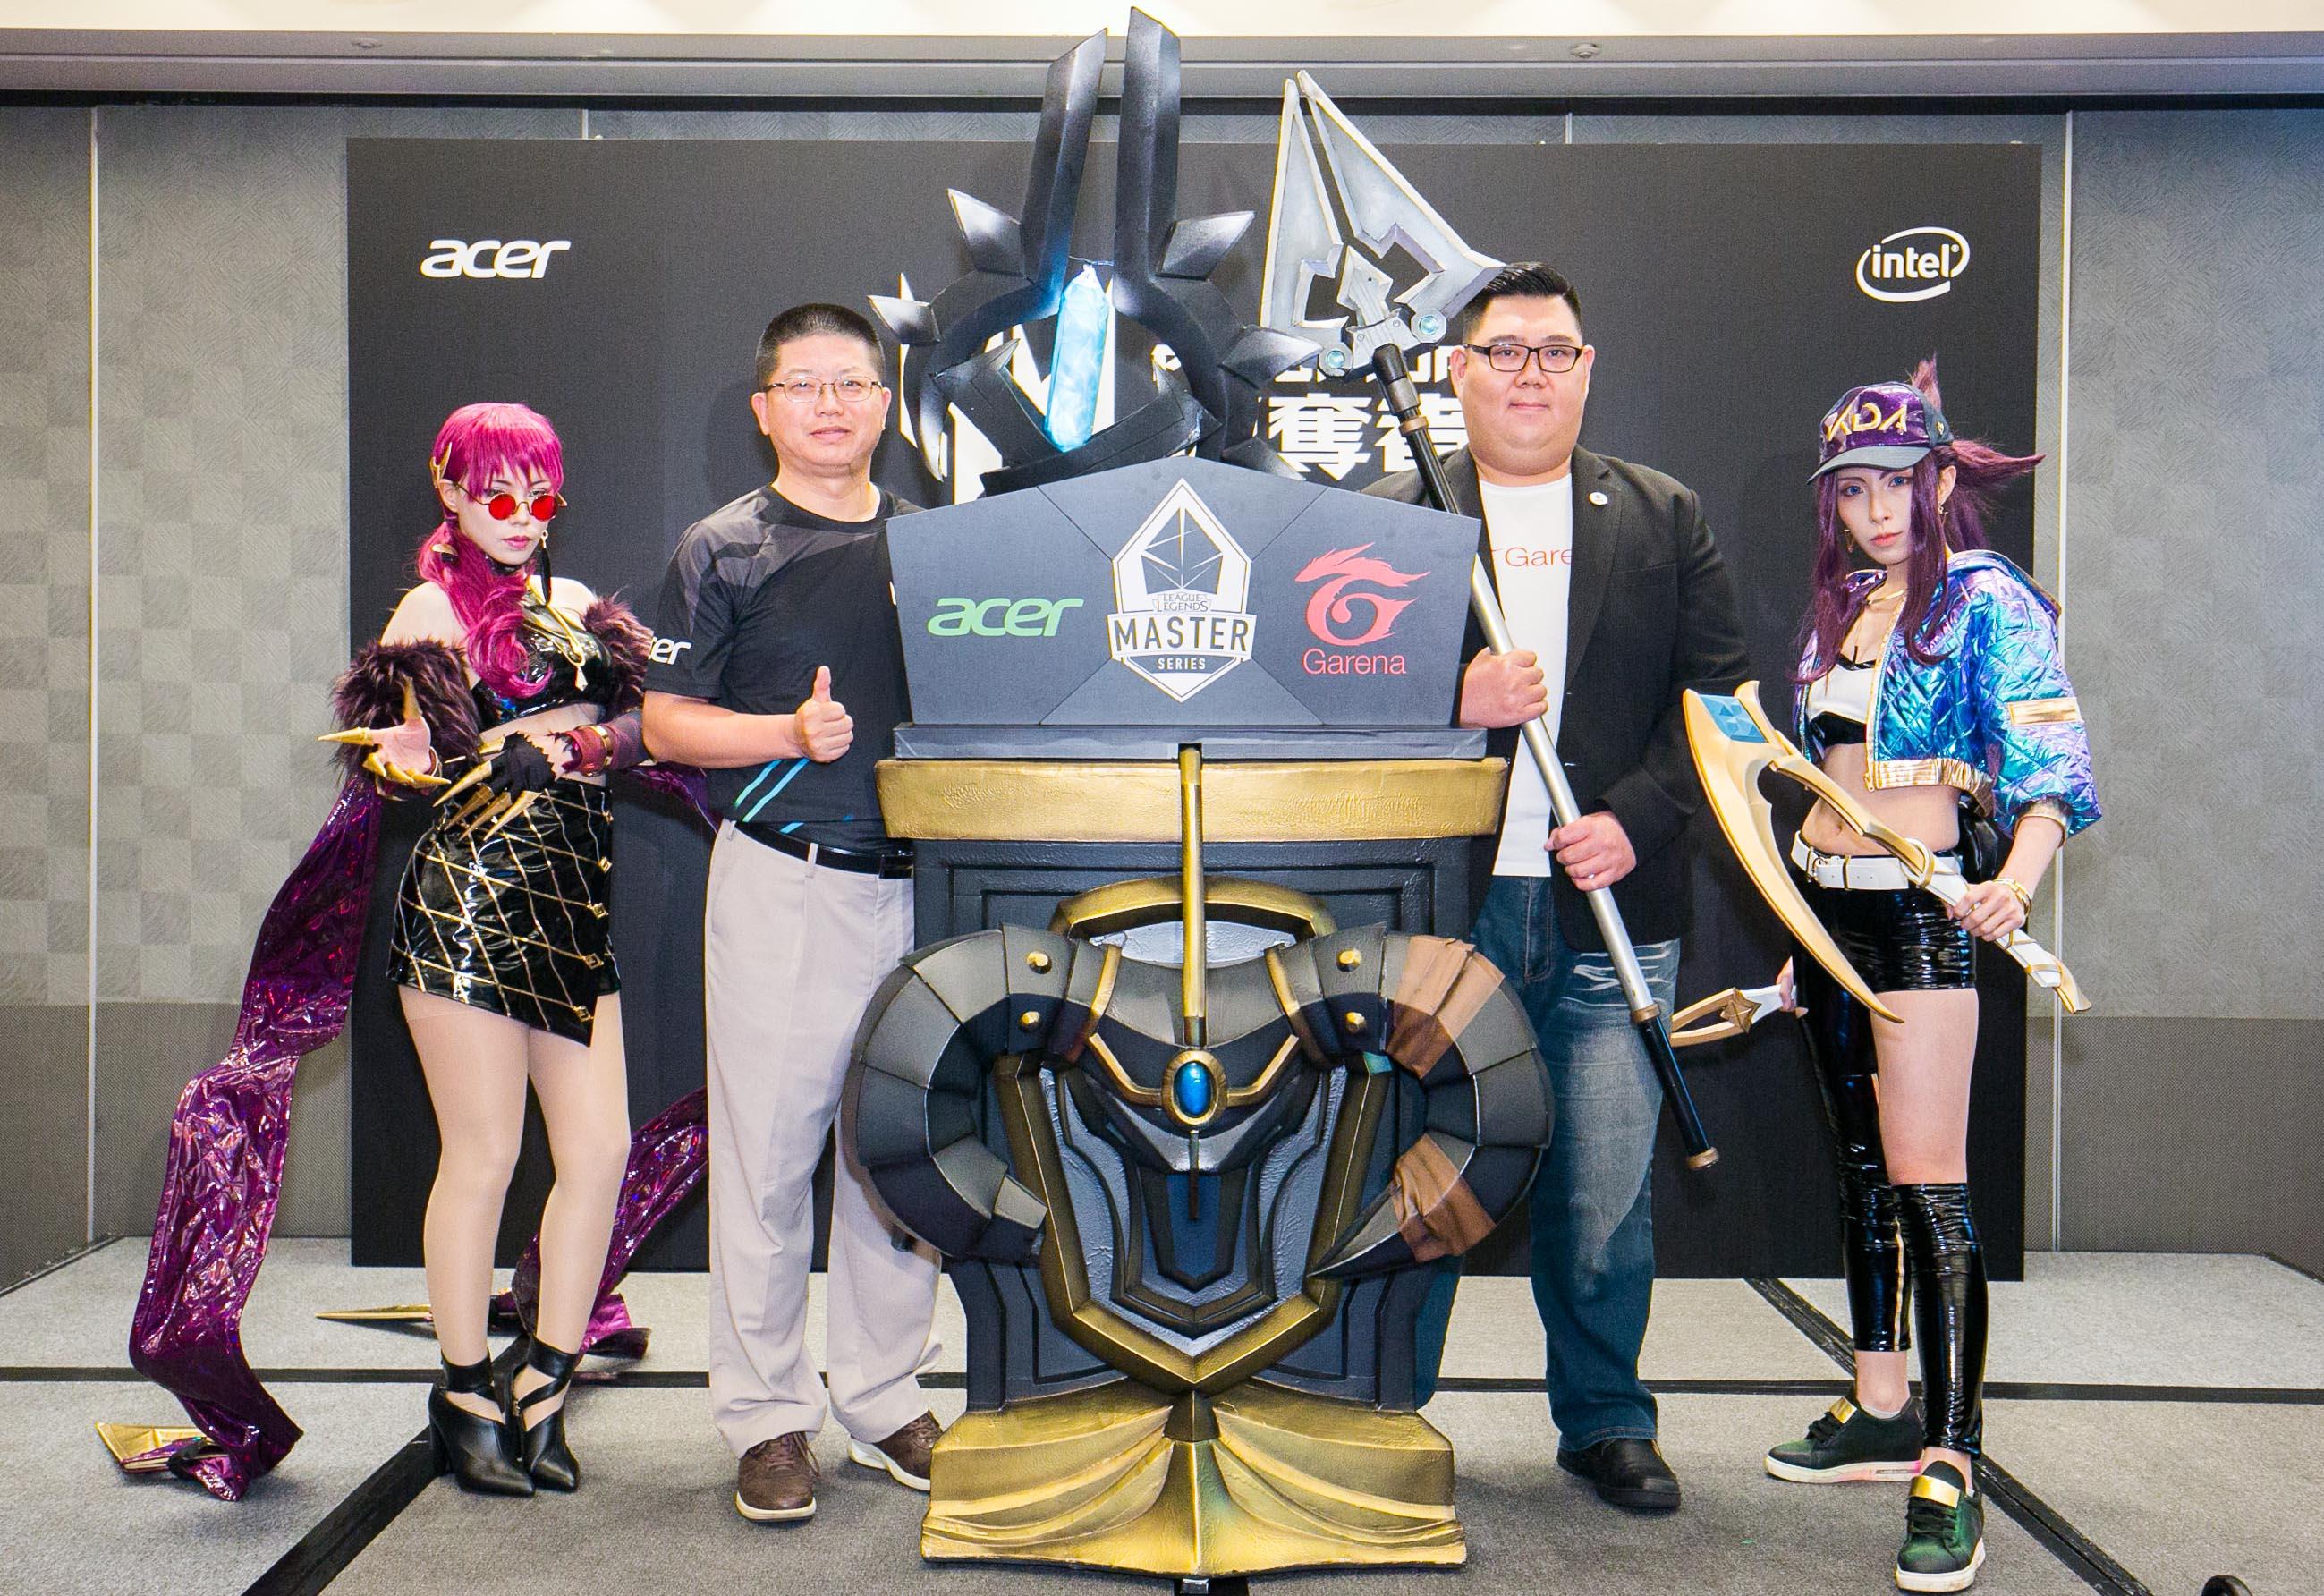 Acer 再與 Garena 合作,為《英雄聯盟》2019 LMS 聯賽官方夥伴